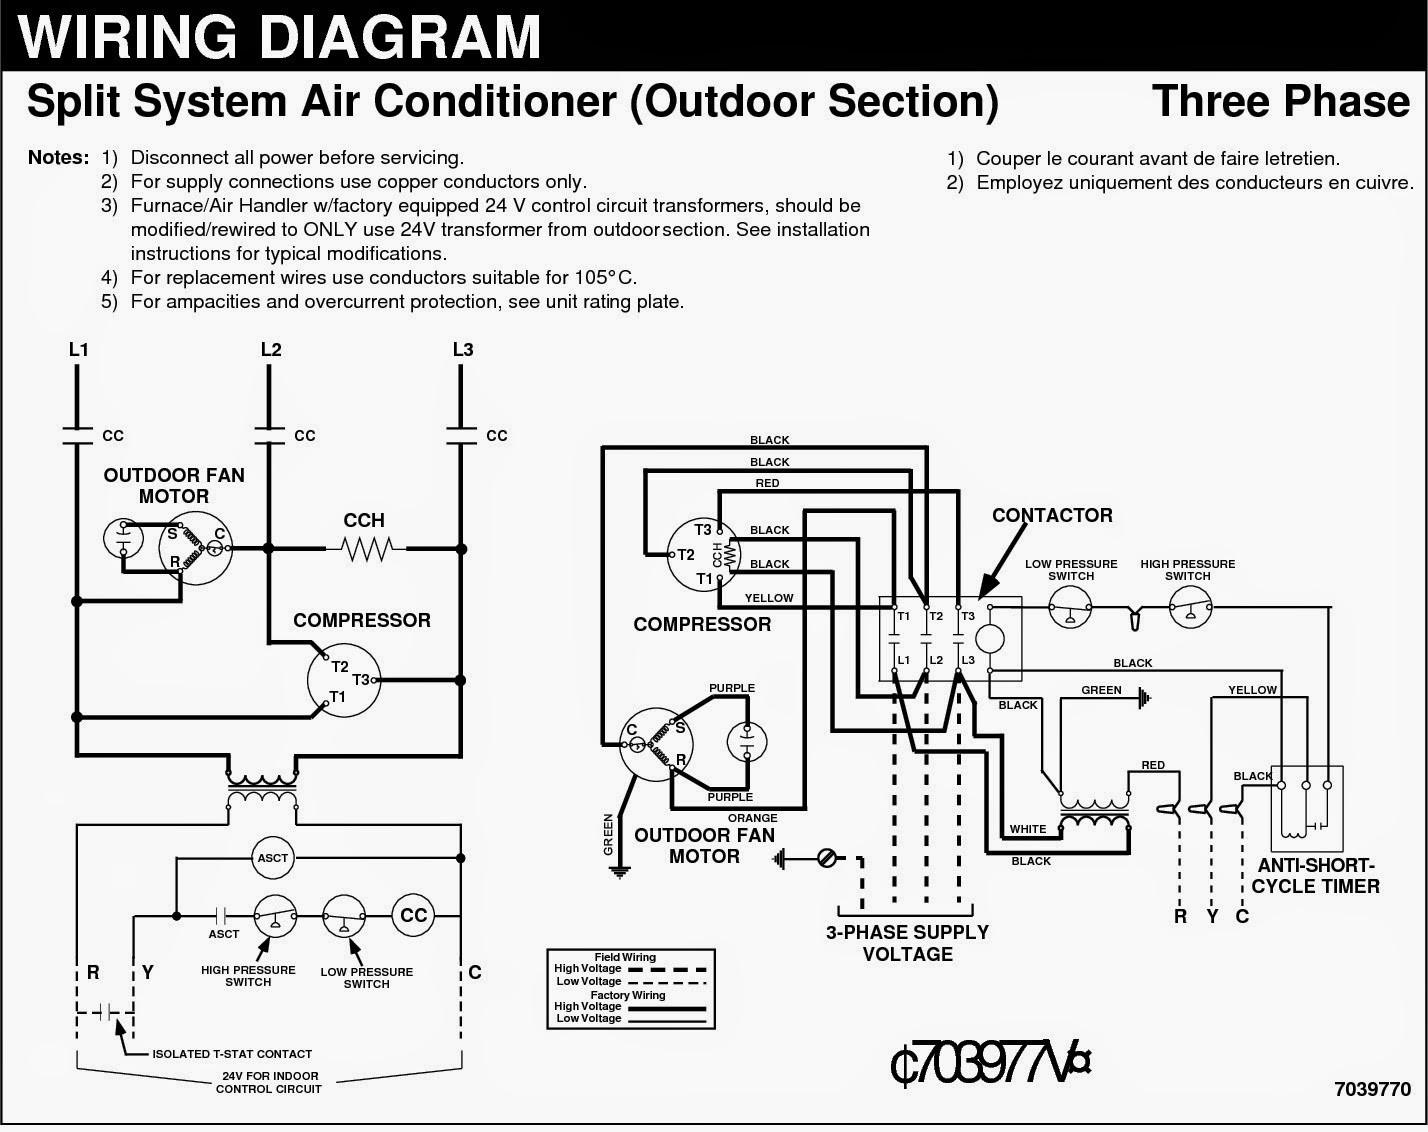 Danfoss Type Hsa3 Wiring Diagram